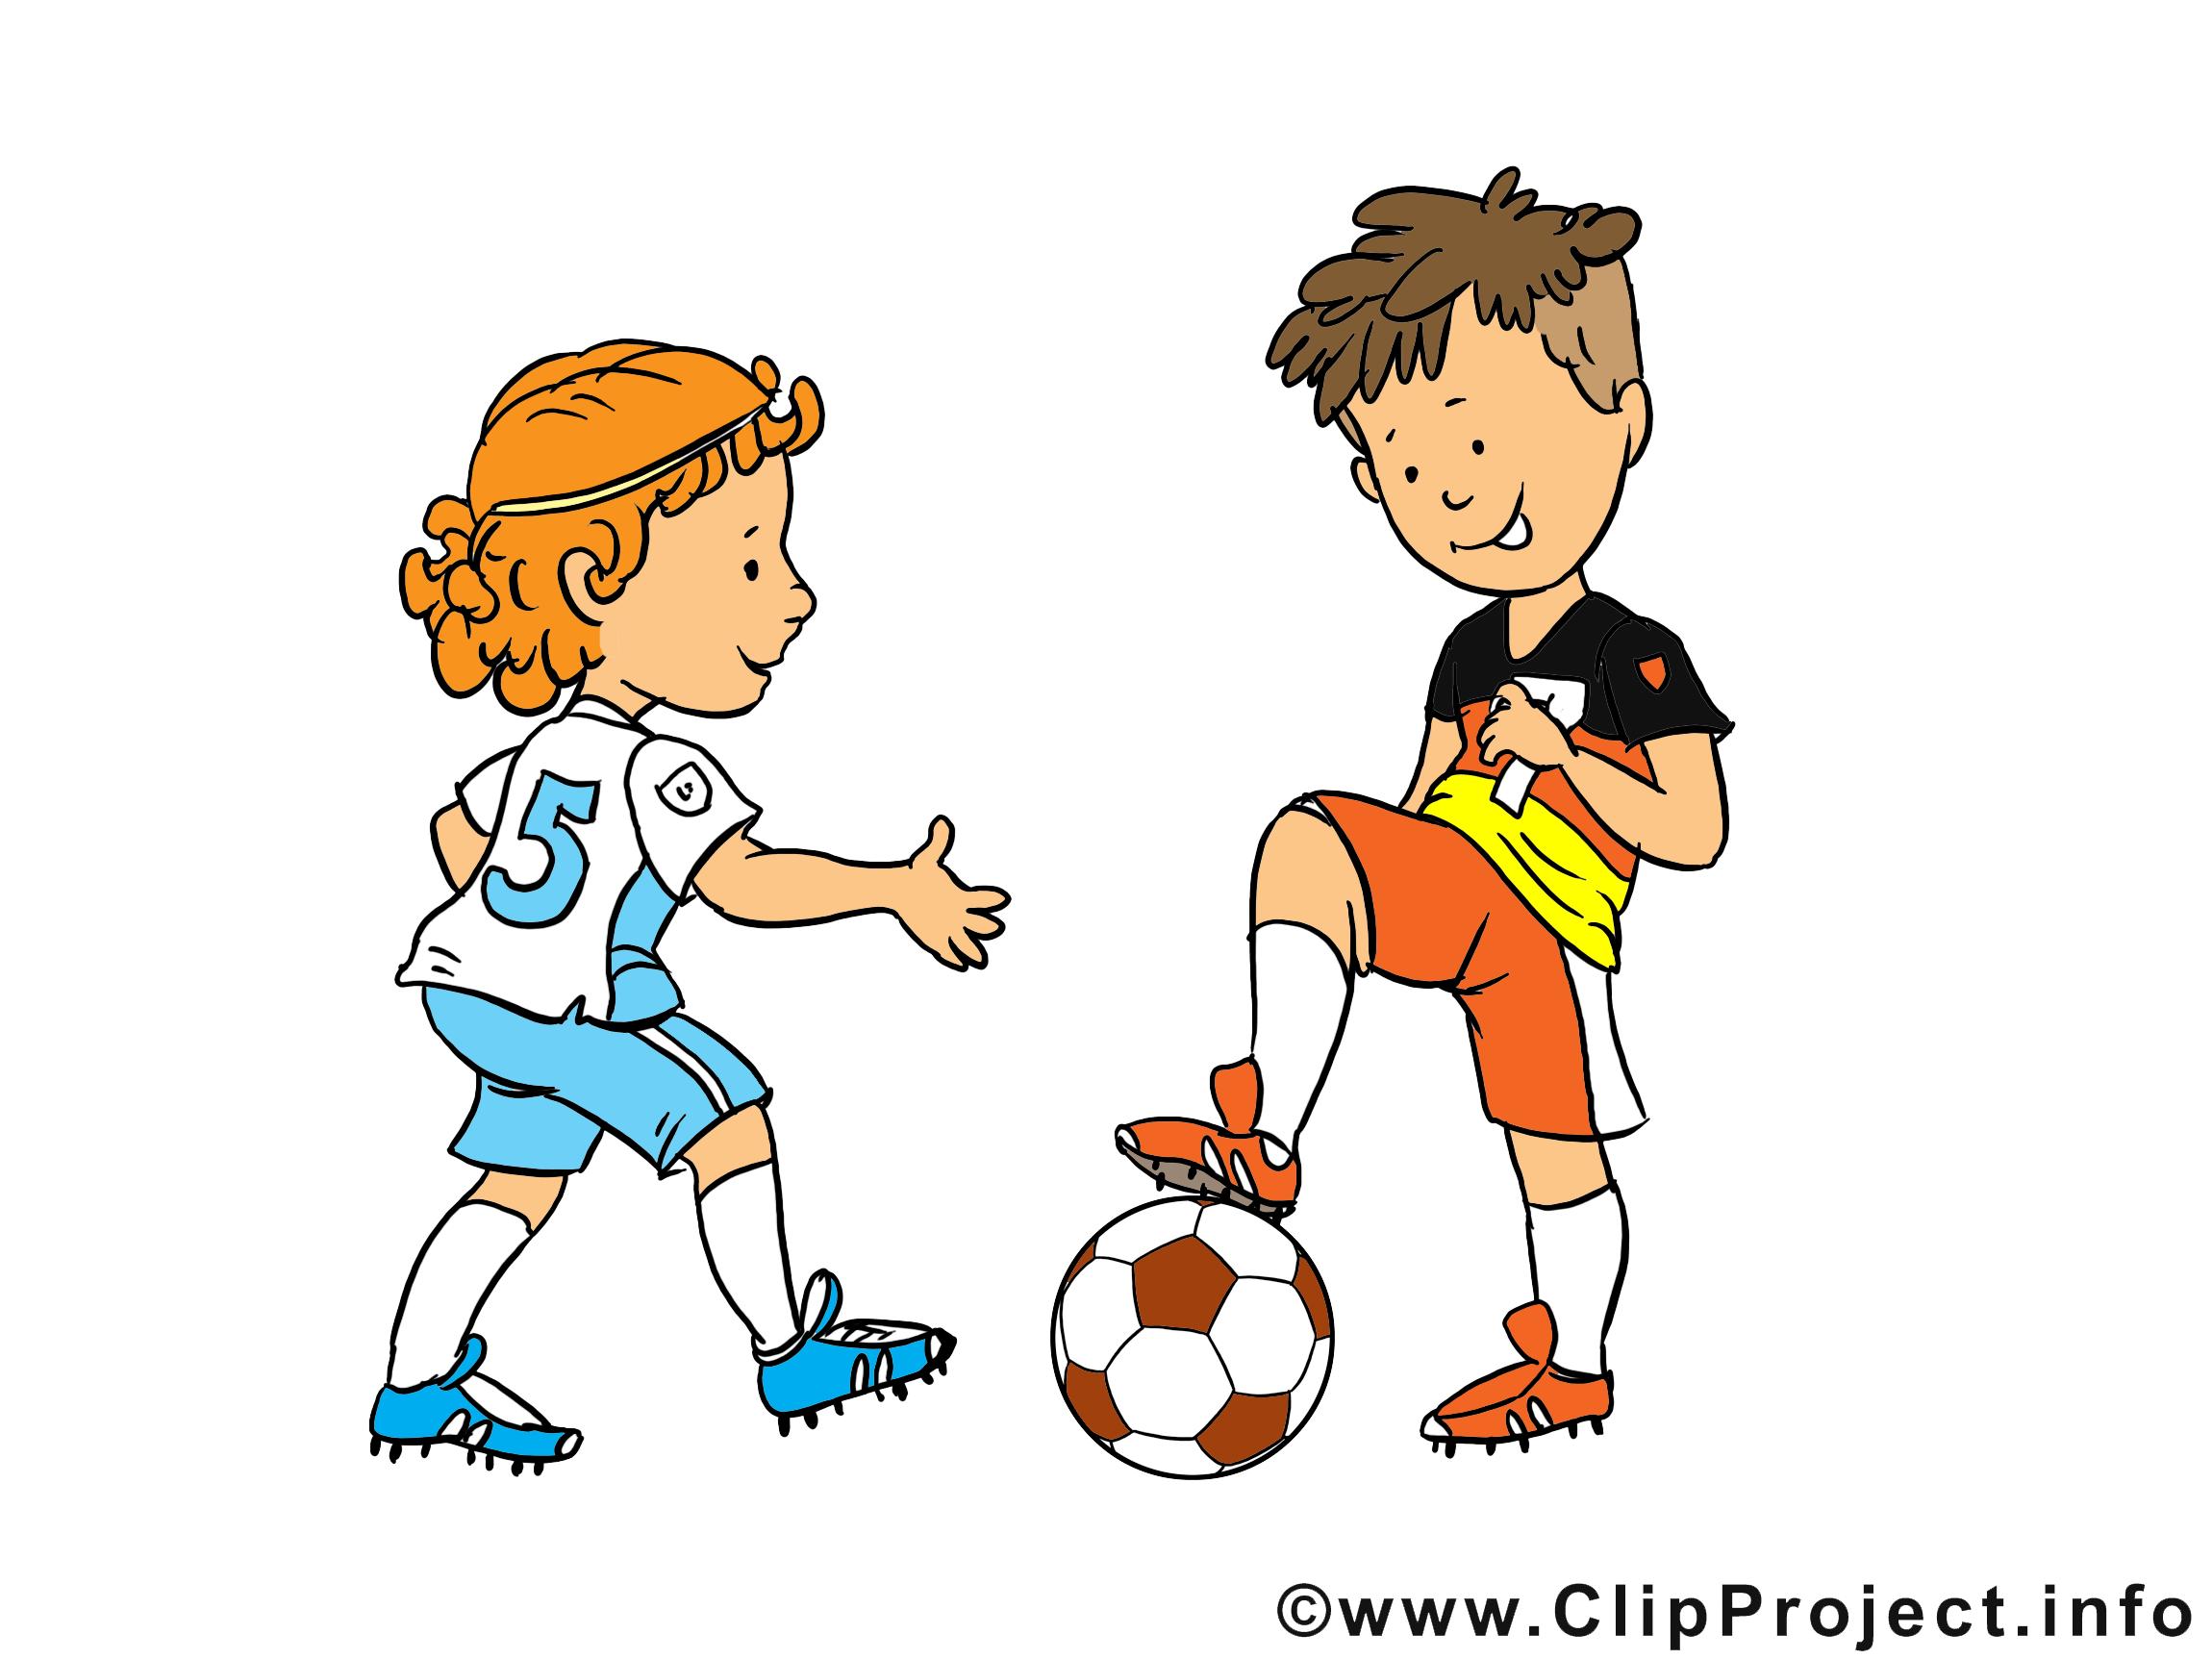 Kostenlos FuГџballspielen